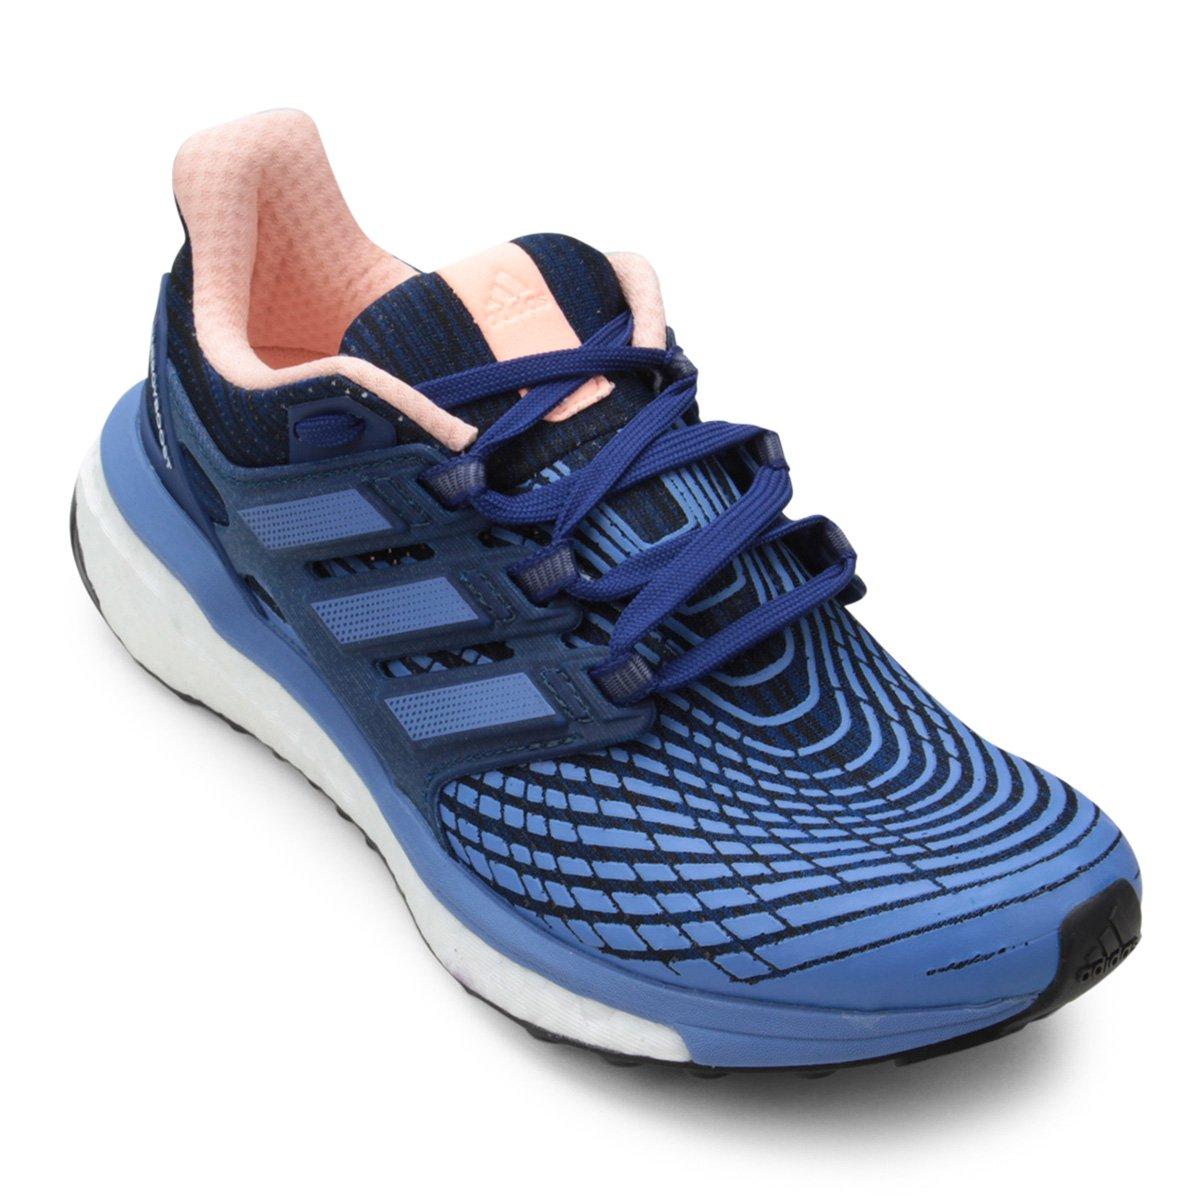 d52cda5b44 Tênis Adidas Energy Boost Feminino. undefined